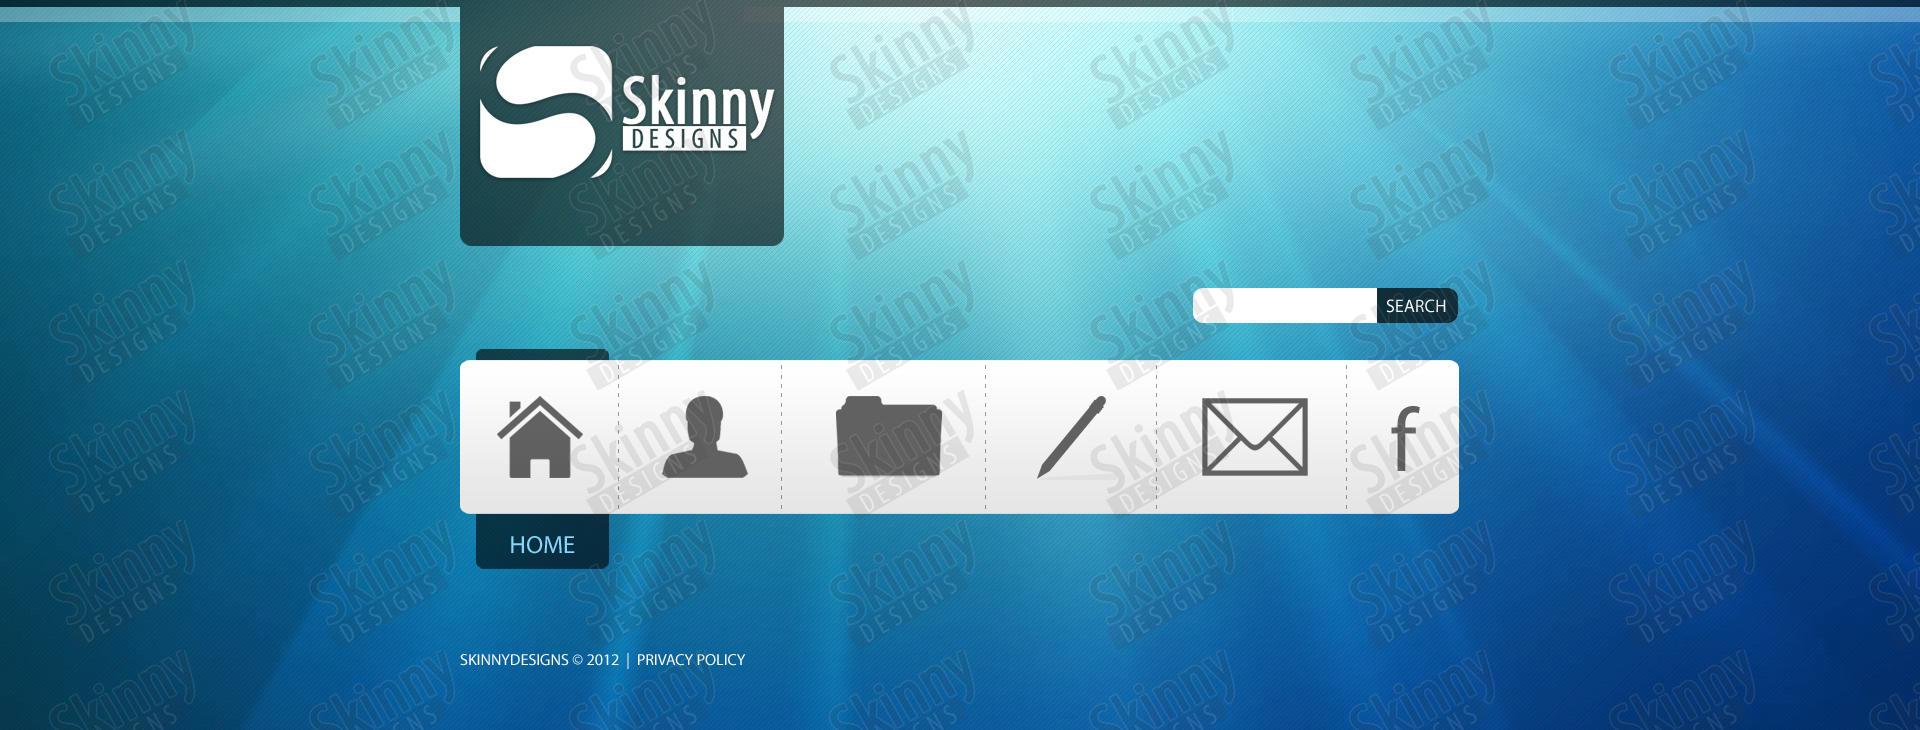 SkinnyDesigns's webdesign #2 by SkinnyDesigns